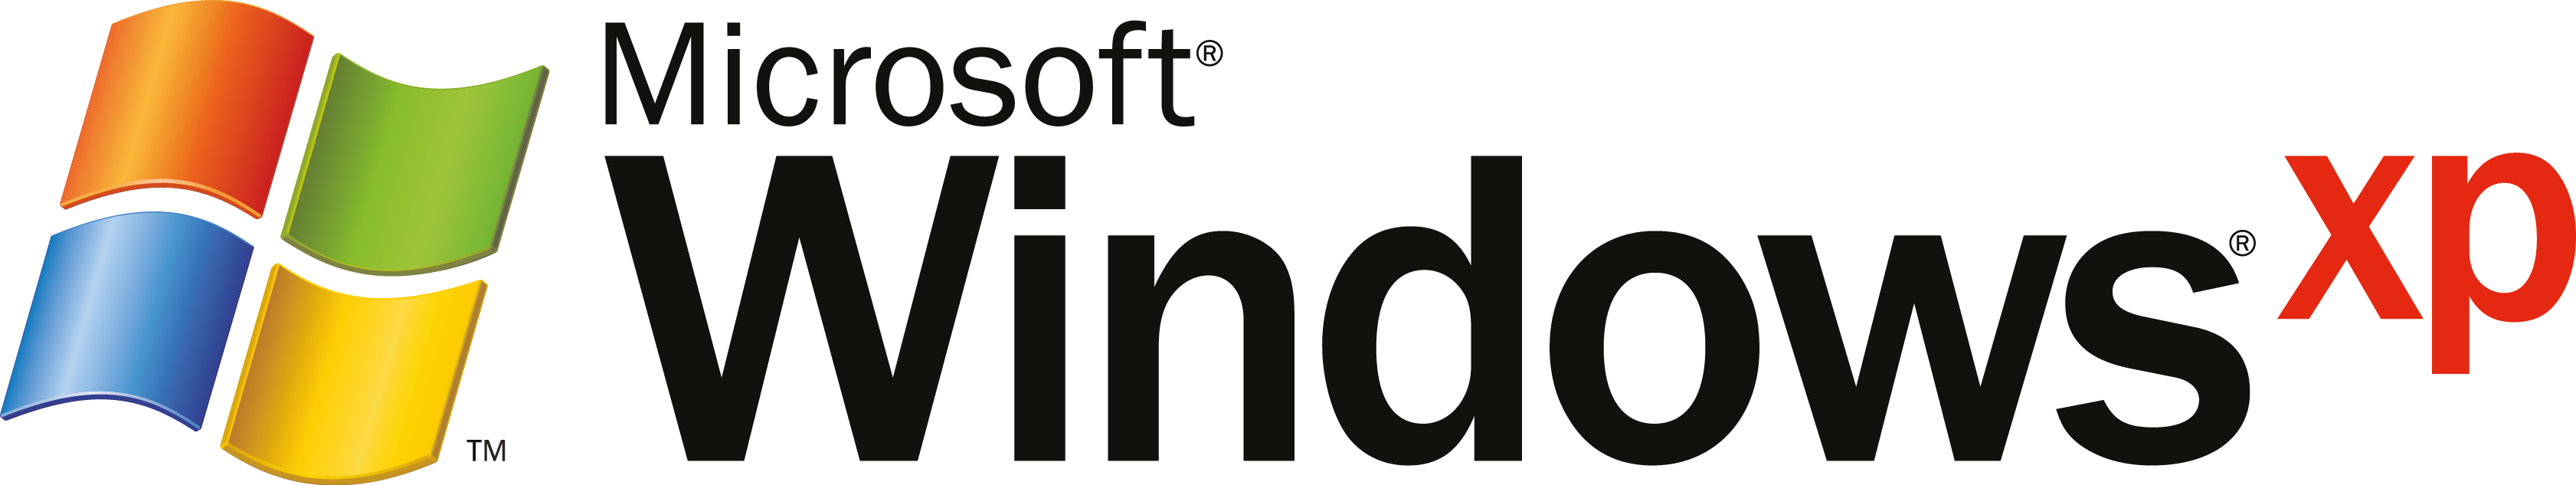 Microsoft Windows Logo PNG - 97799